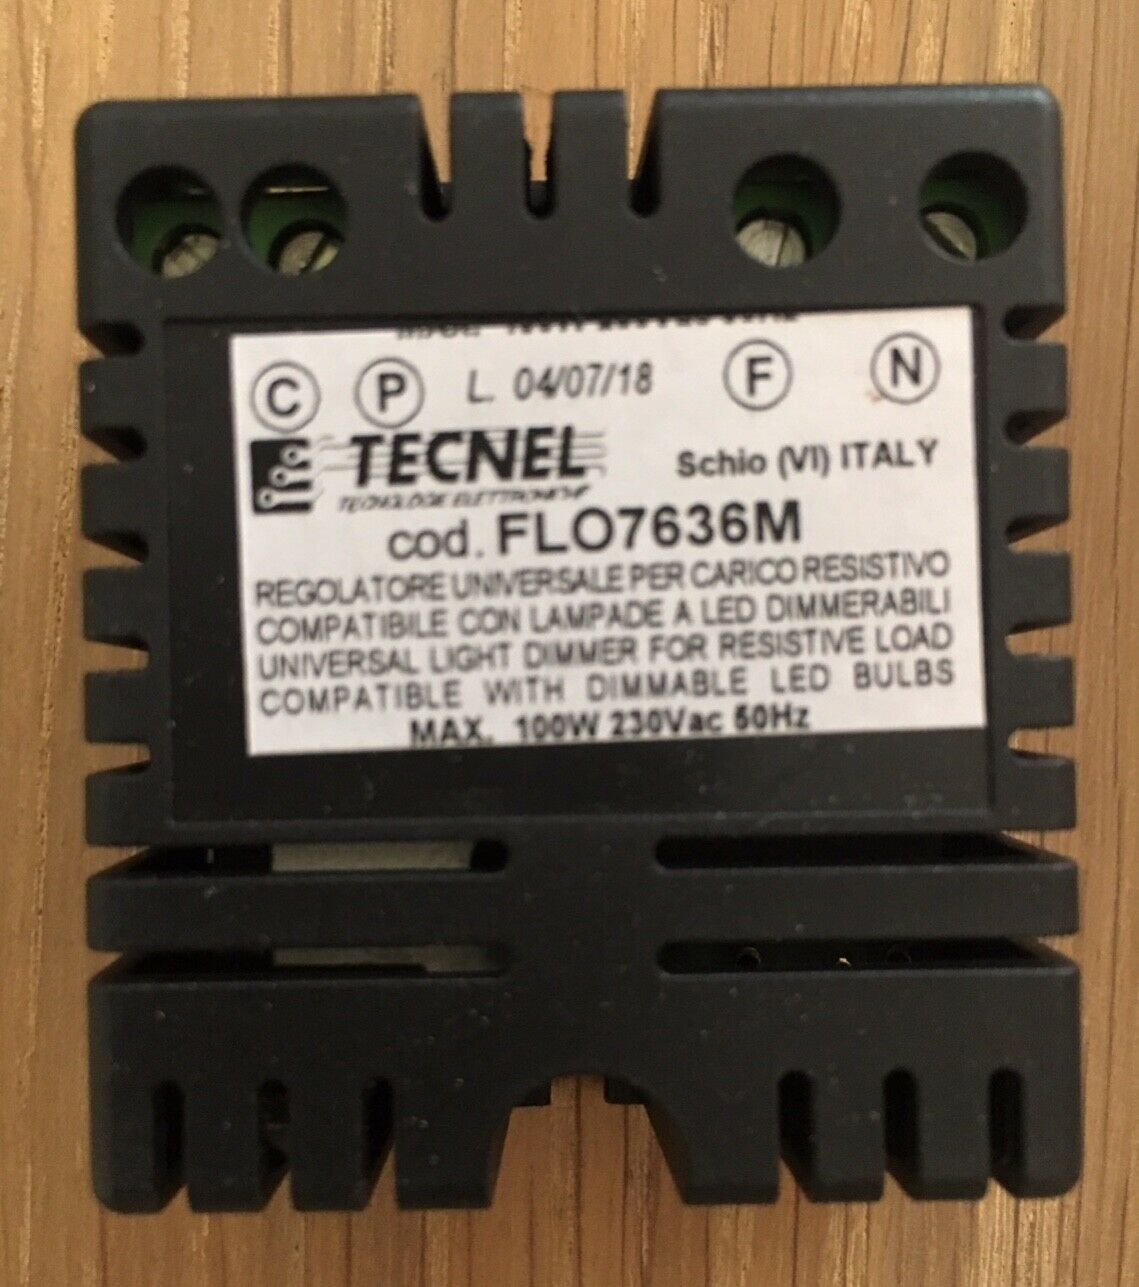 Tecnel Wanddimmer für Flos Aim FLO7636M LED 100W 230V NEU - originalverpackt